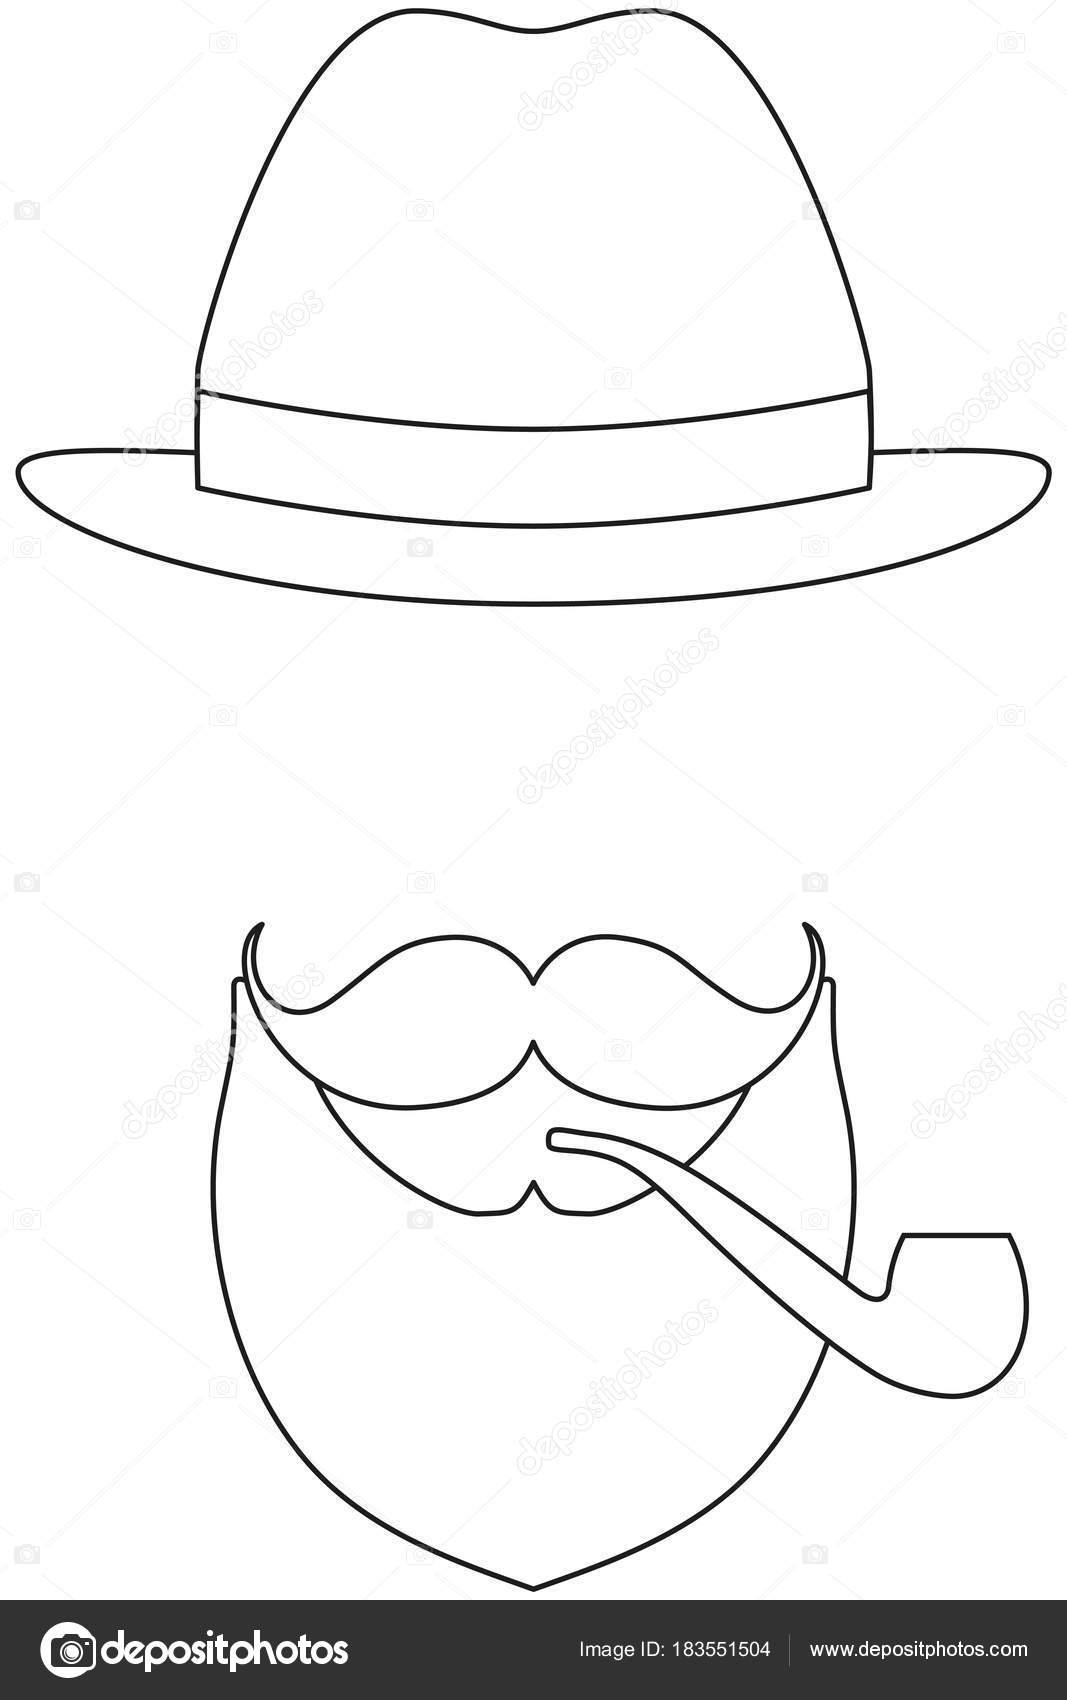 şapka Bıyık Sigara Tütün Boru Sakal Kunduz Simgesi Hat Sanat Poster